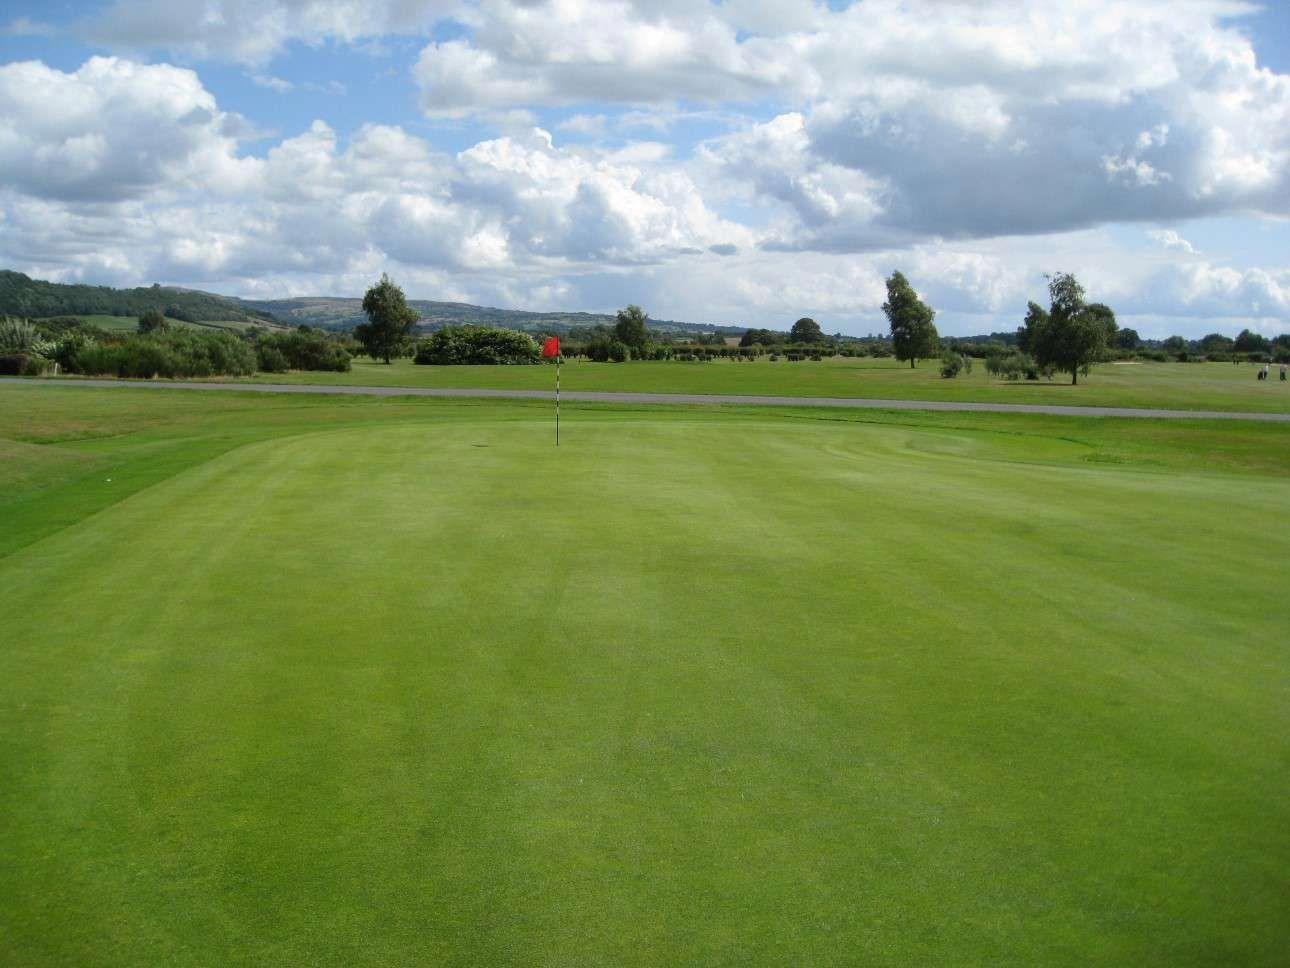 southern mens golf lands - HD1290×968